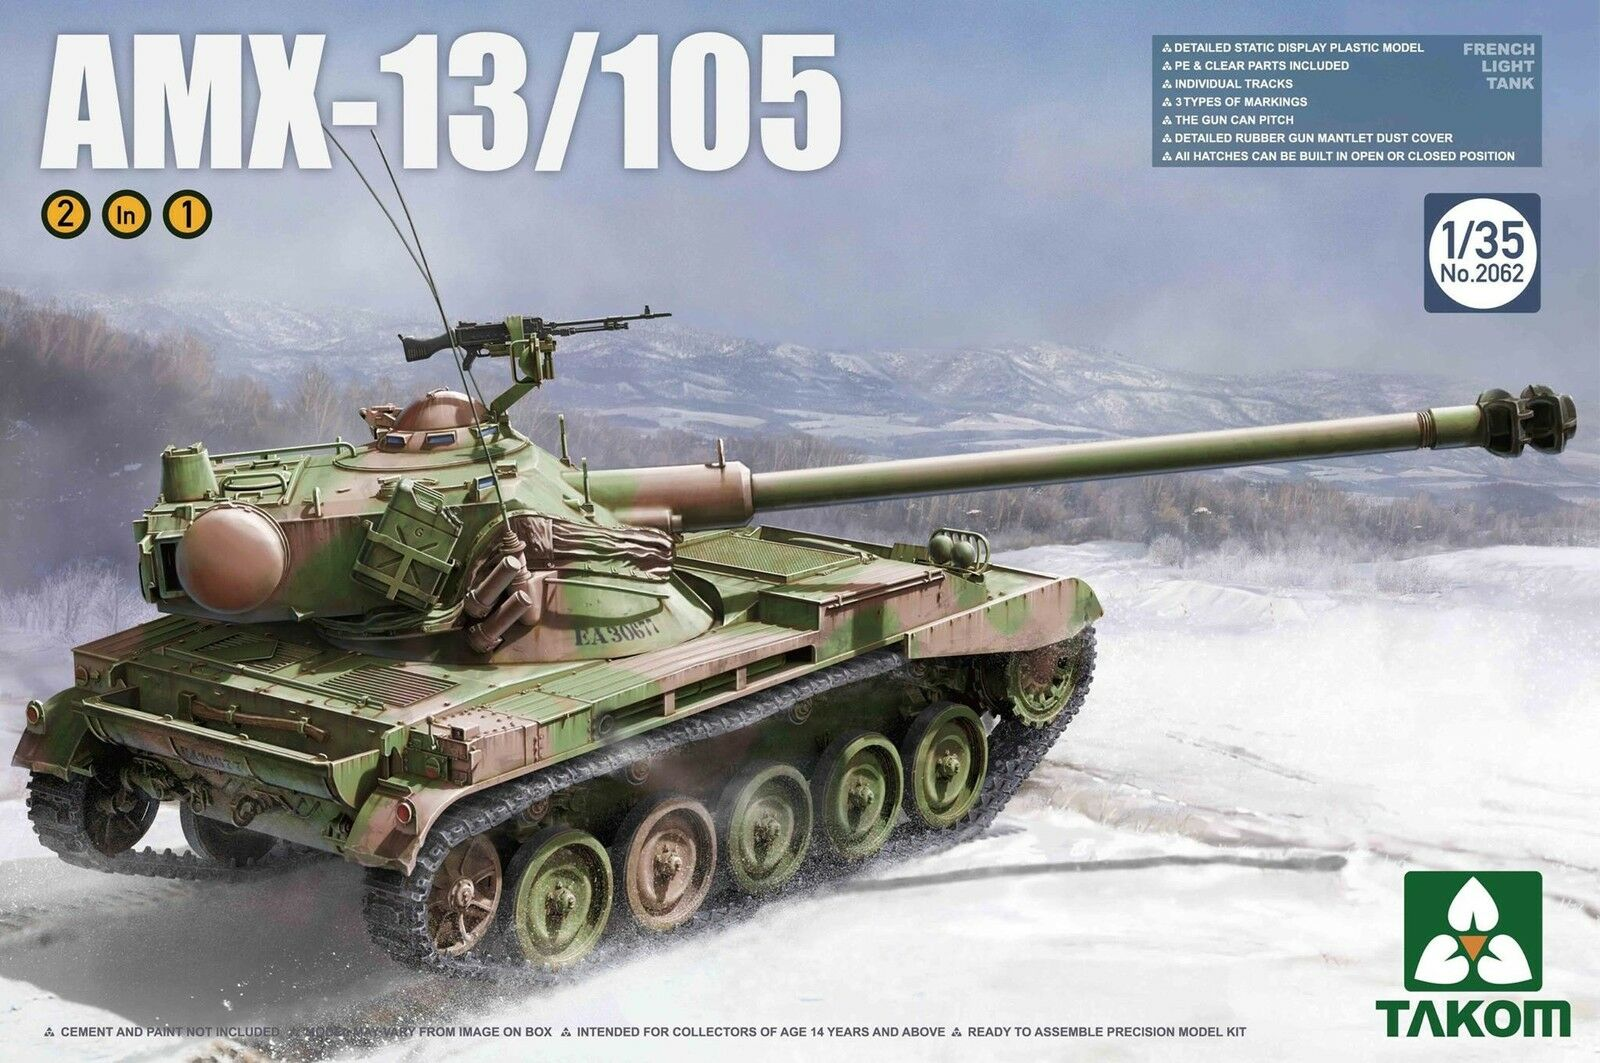 Char léger Français AMX-13 105 - Kit TAKOM 1 35 Réf. 2062